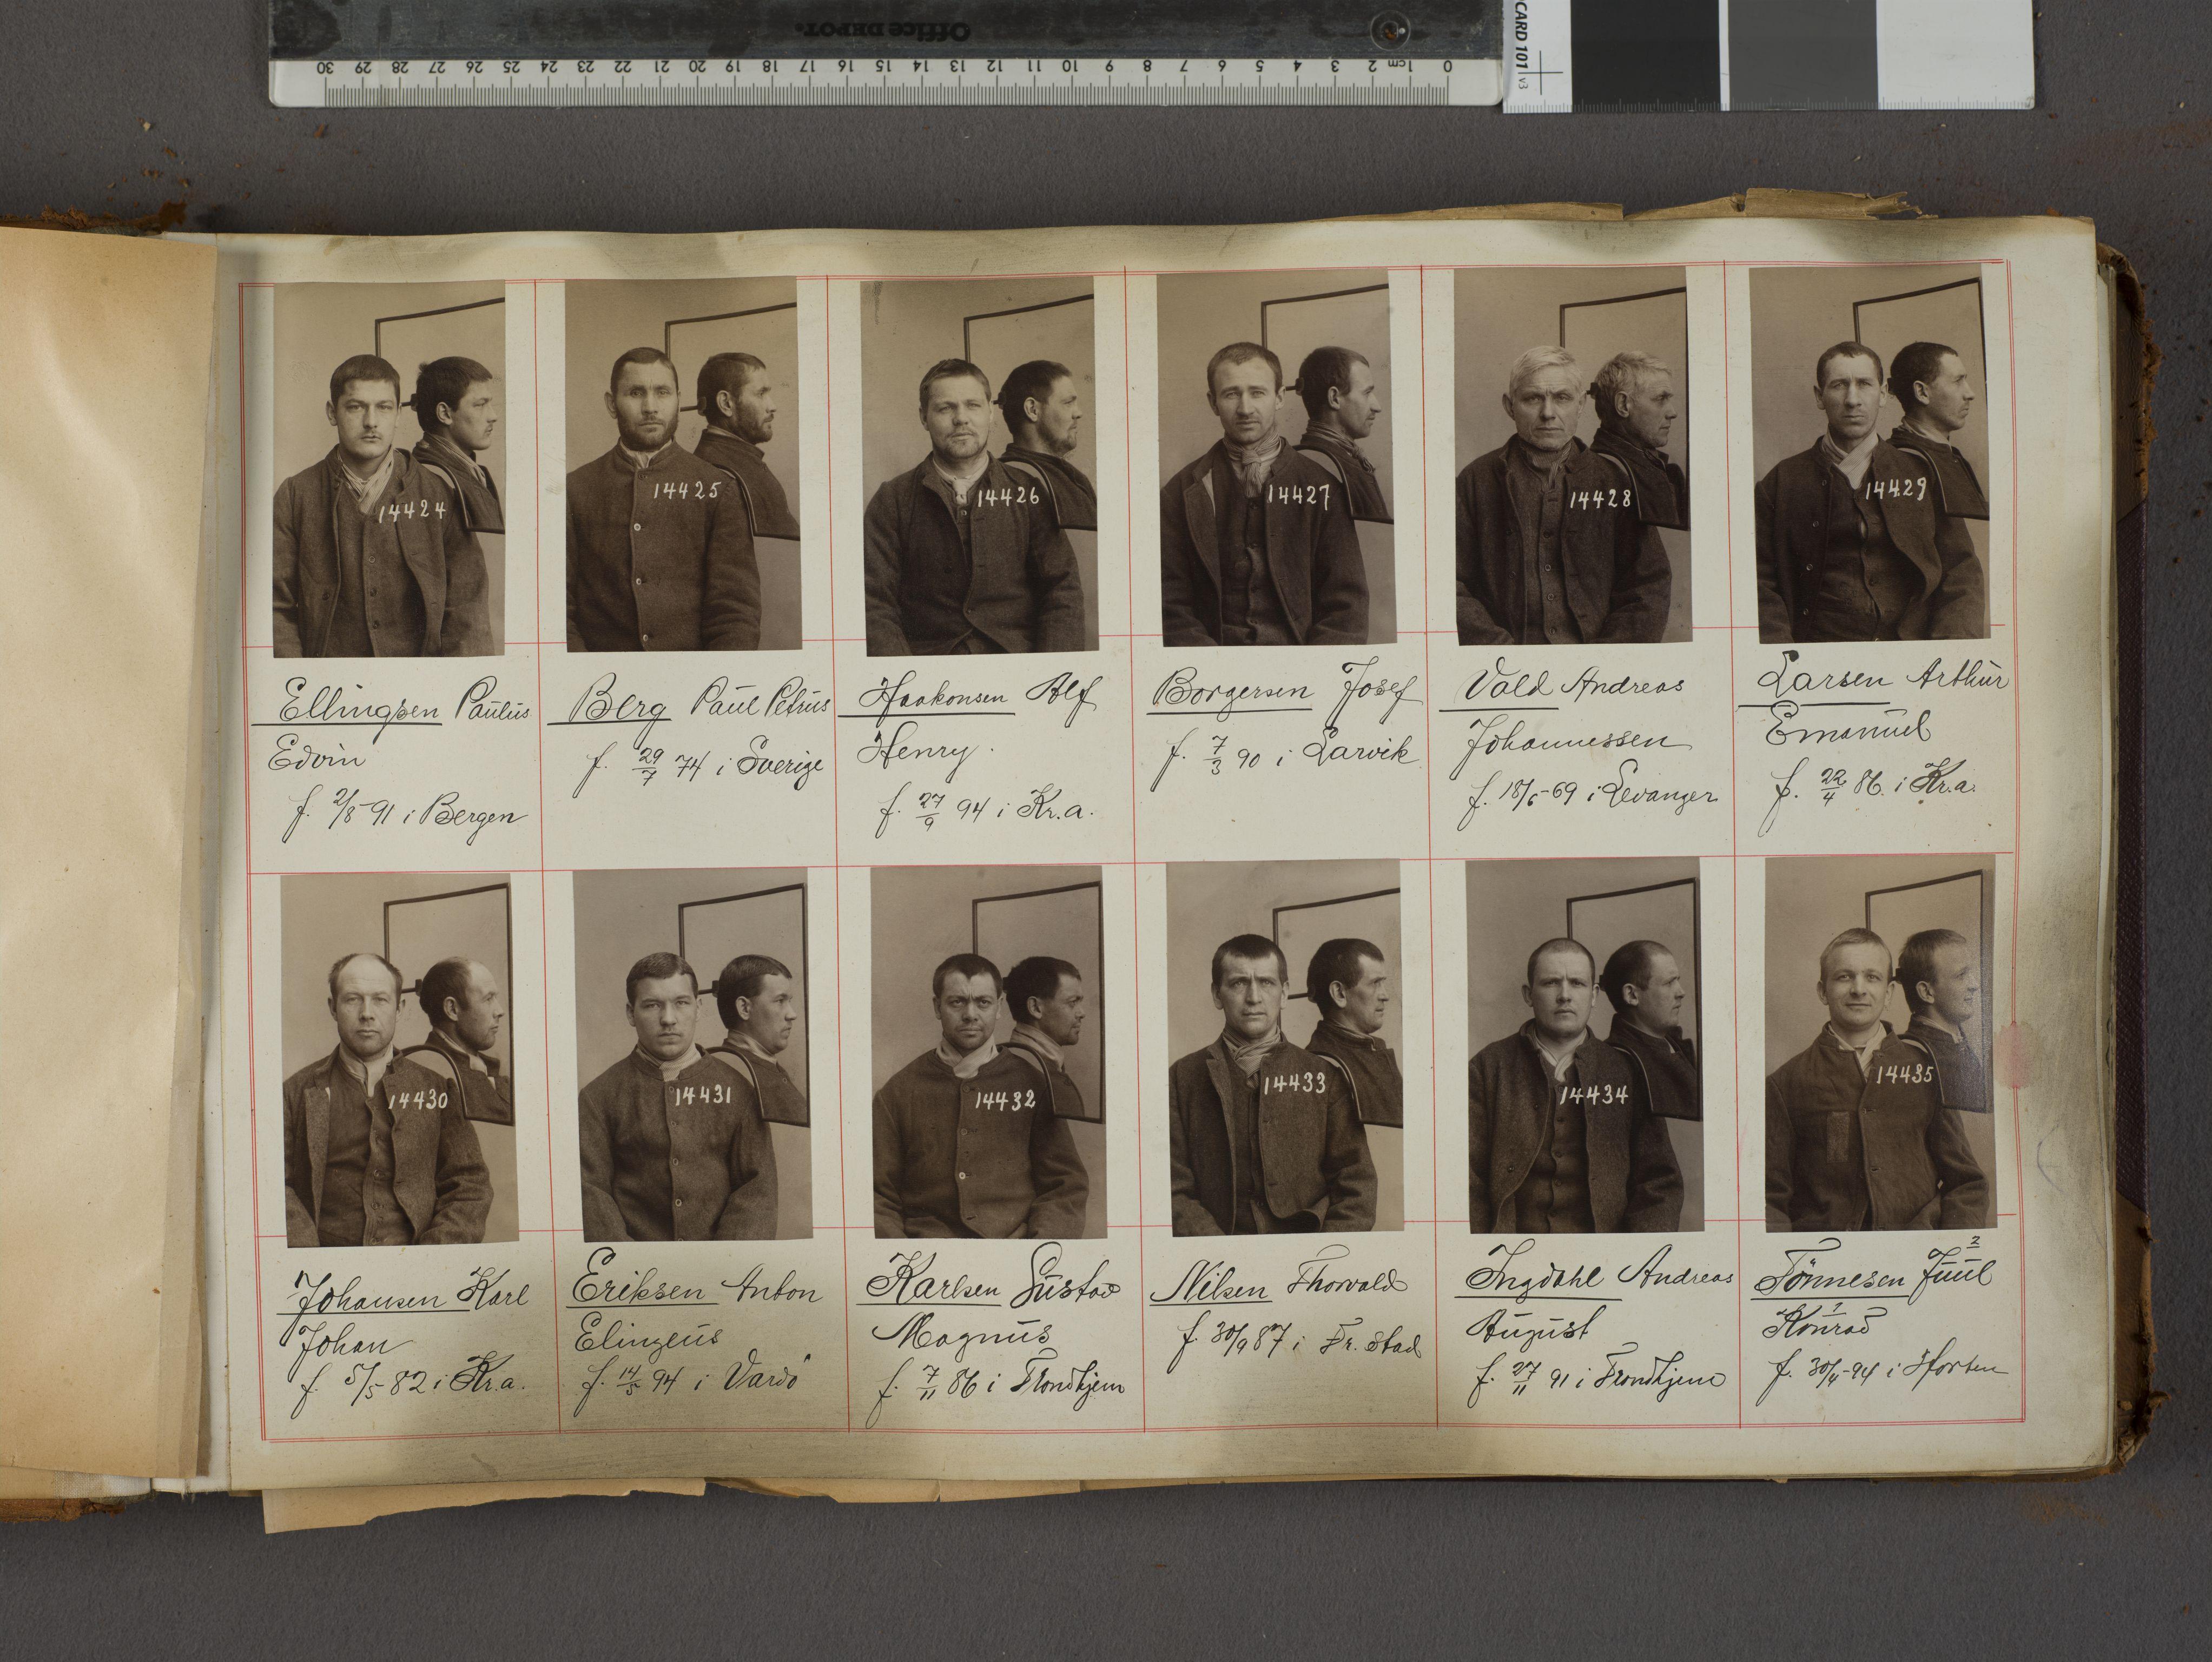 RA, Oslo politikammer, Kriminalavdelingen, U/Ua/L0017: Forbryteralbum, 1915-1920, s. 1